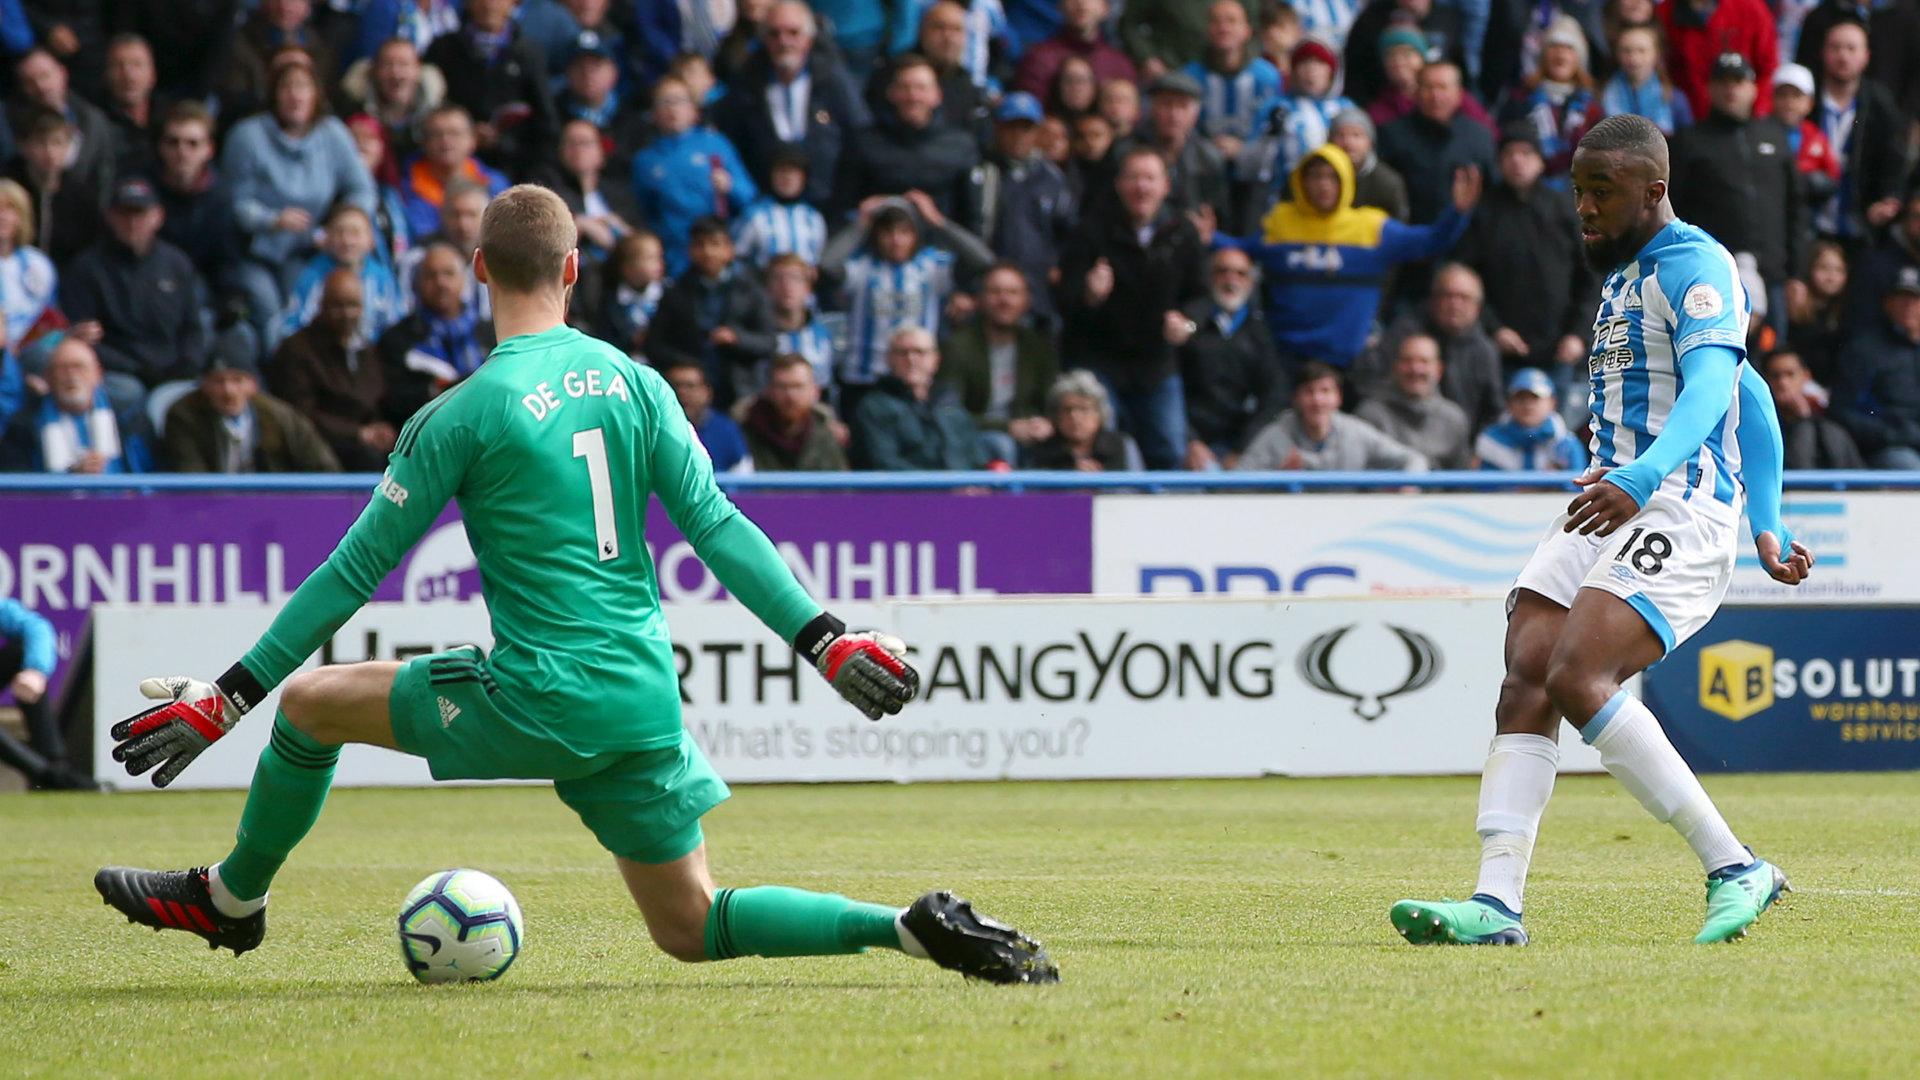 Isaac Mbenza Huddersfield vs Man Utd Premier League 2018-19